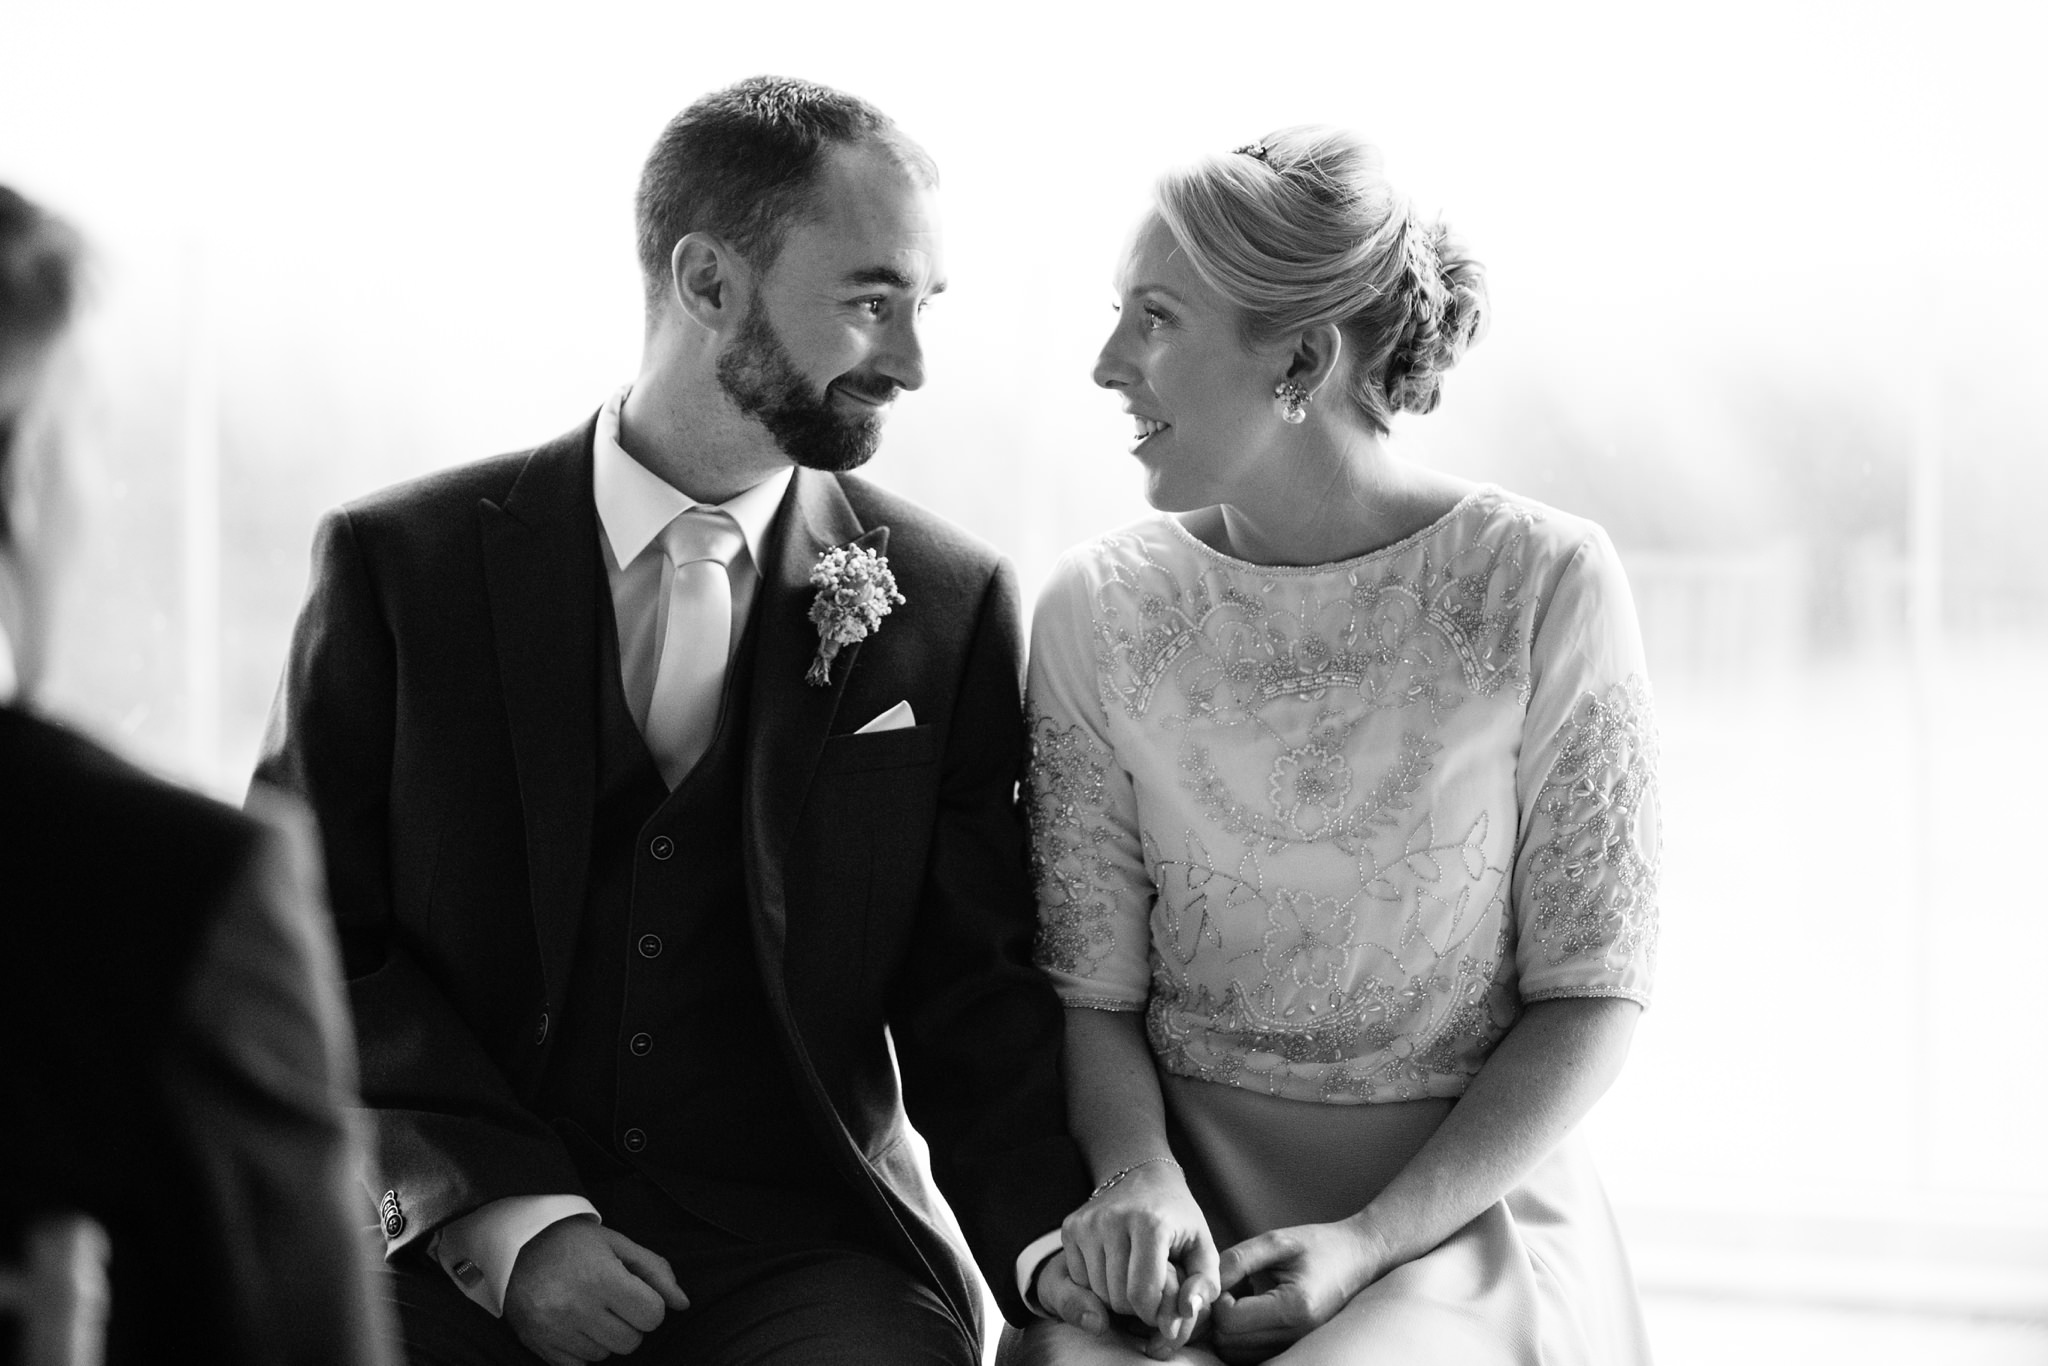 Elisha-Clarke-Photography-Dublin-City-Wedding_0070.jpg